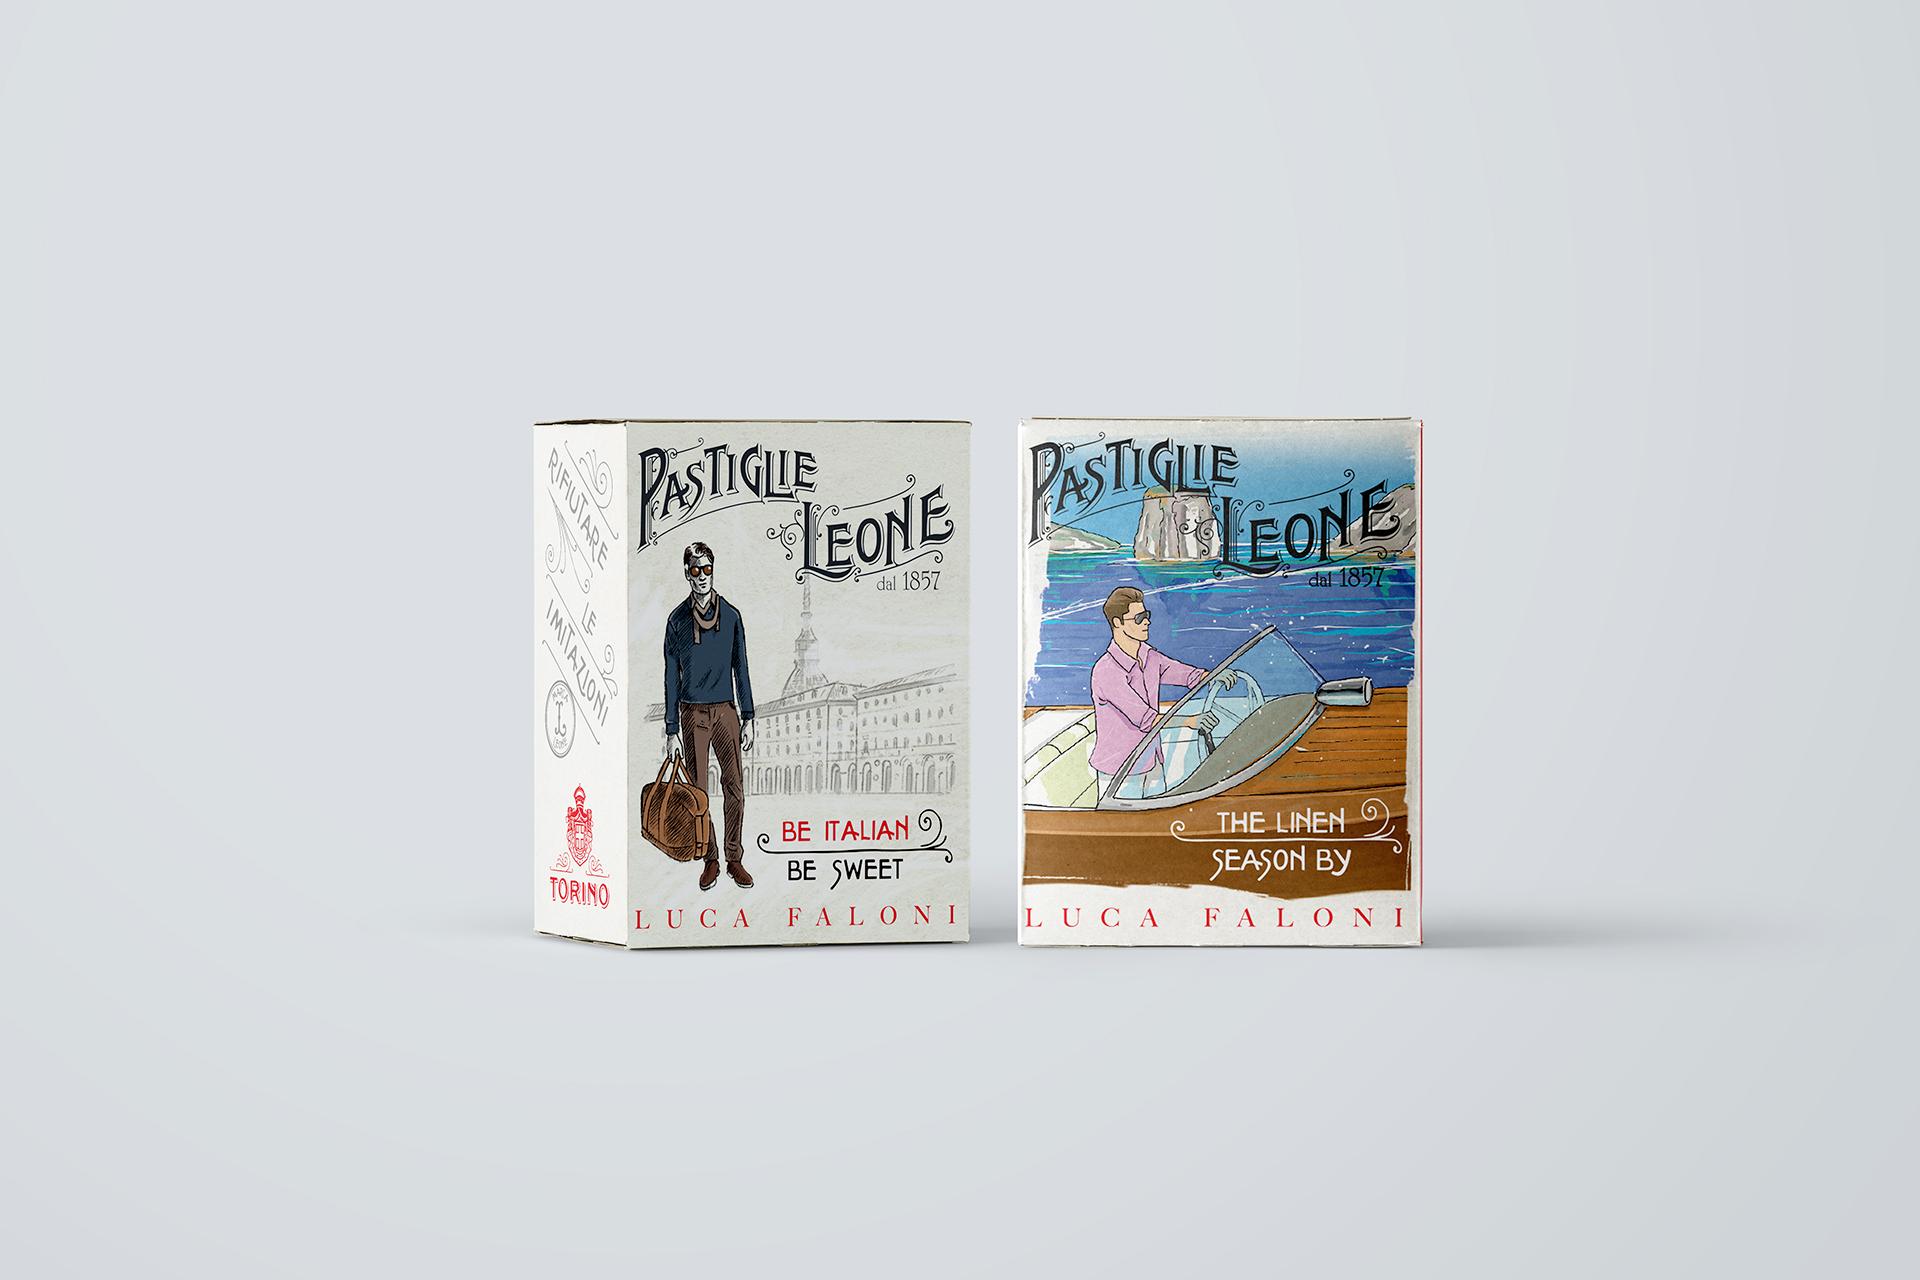 Luca Faloni custom boxes / Pastiglie Leone